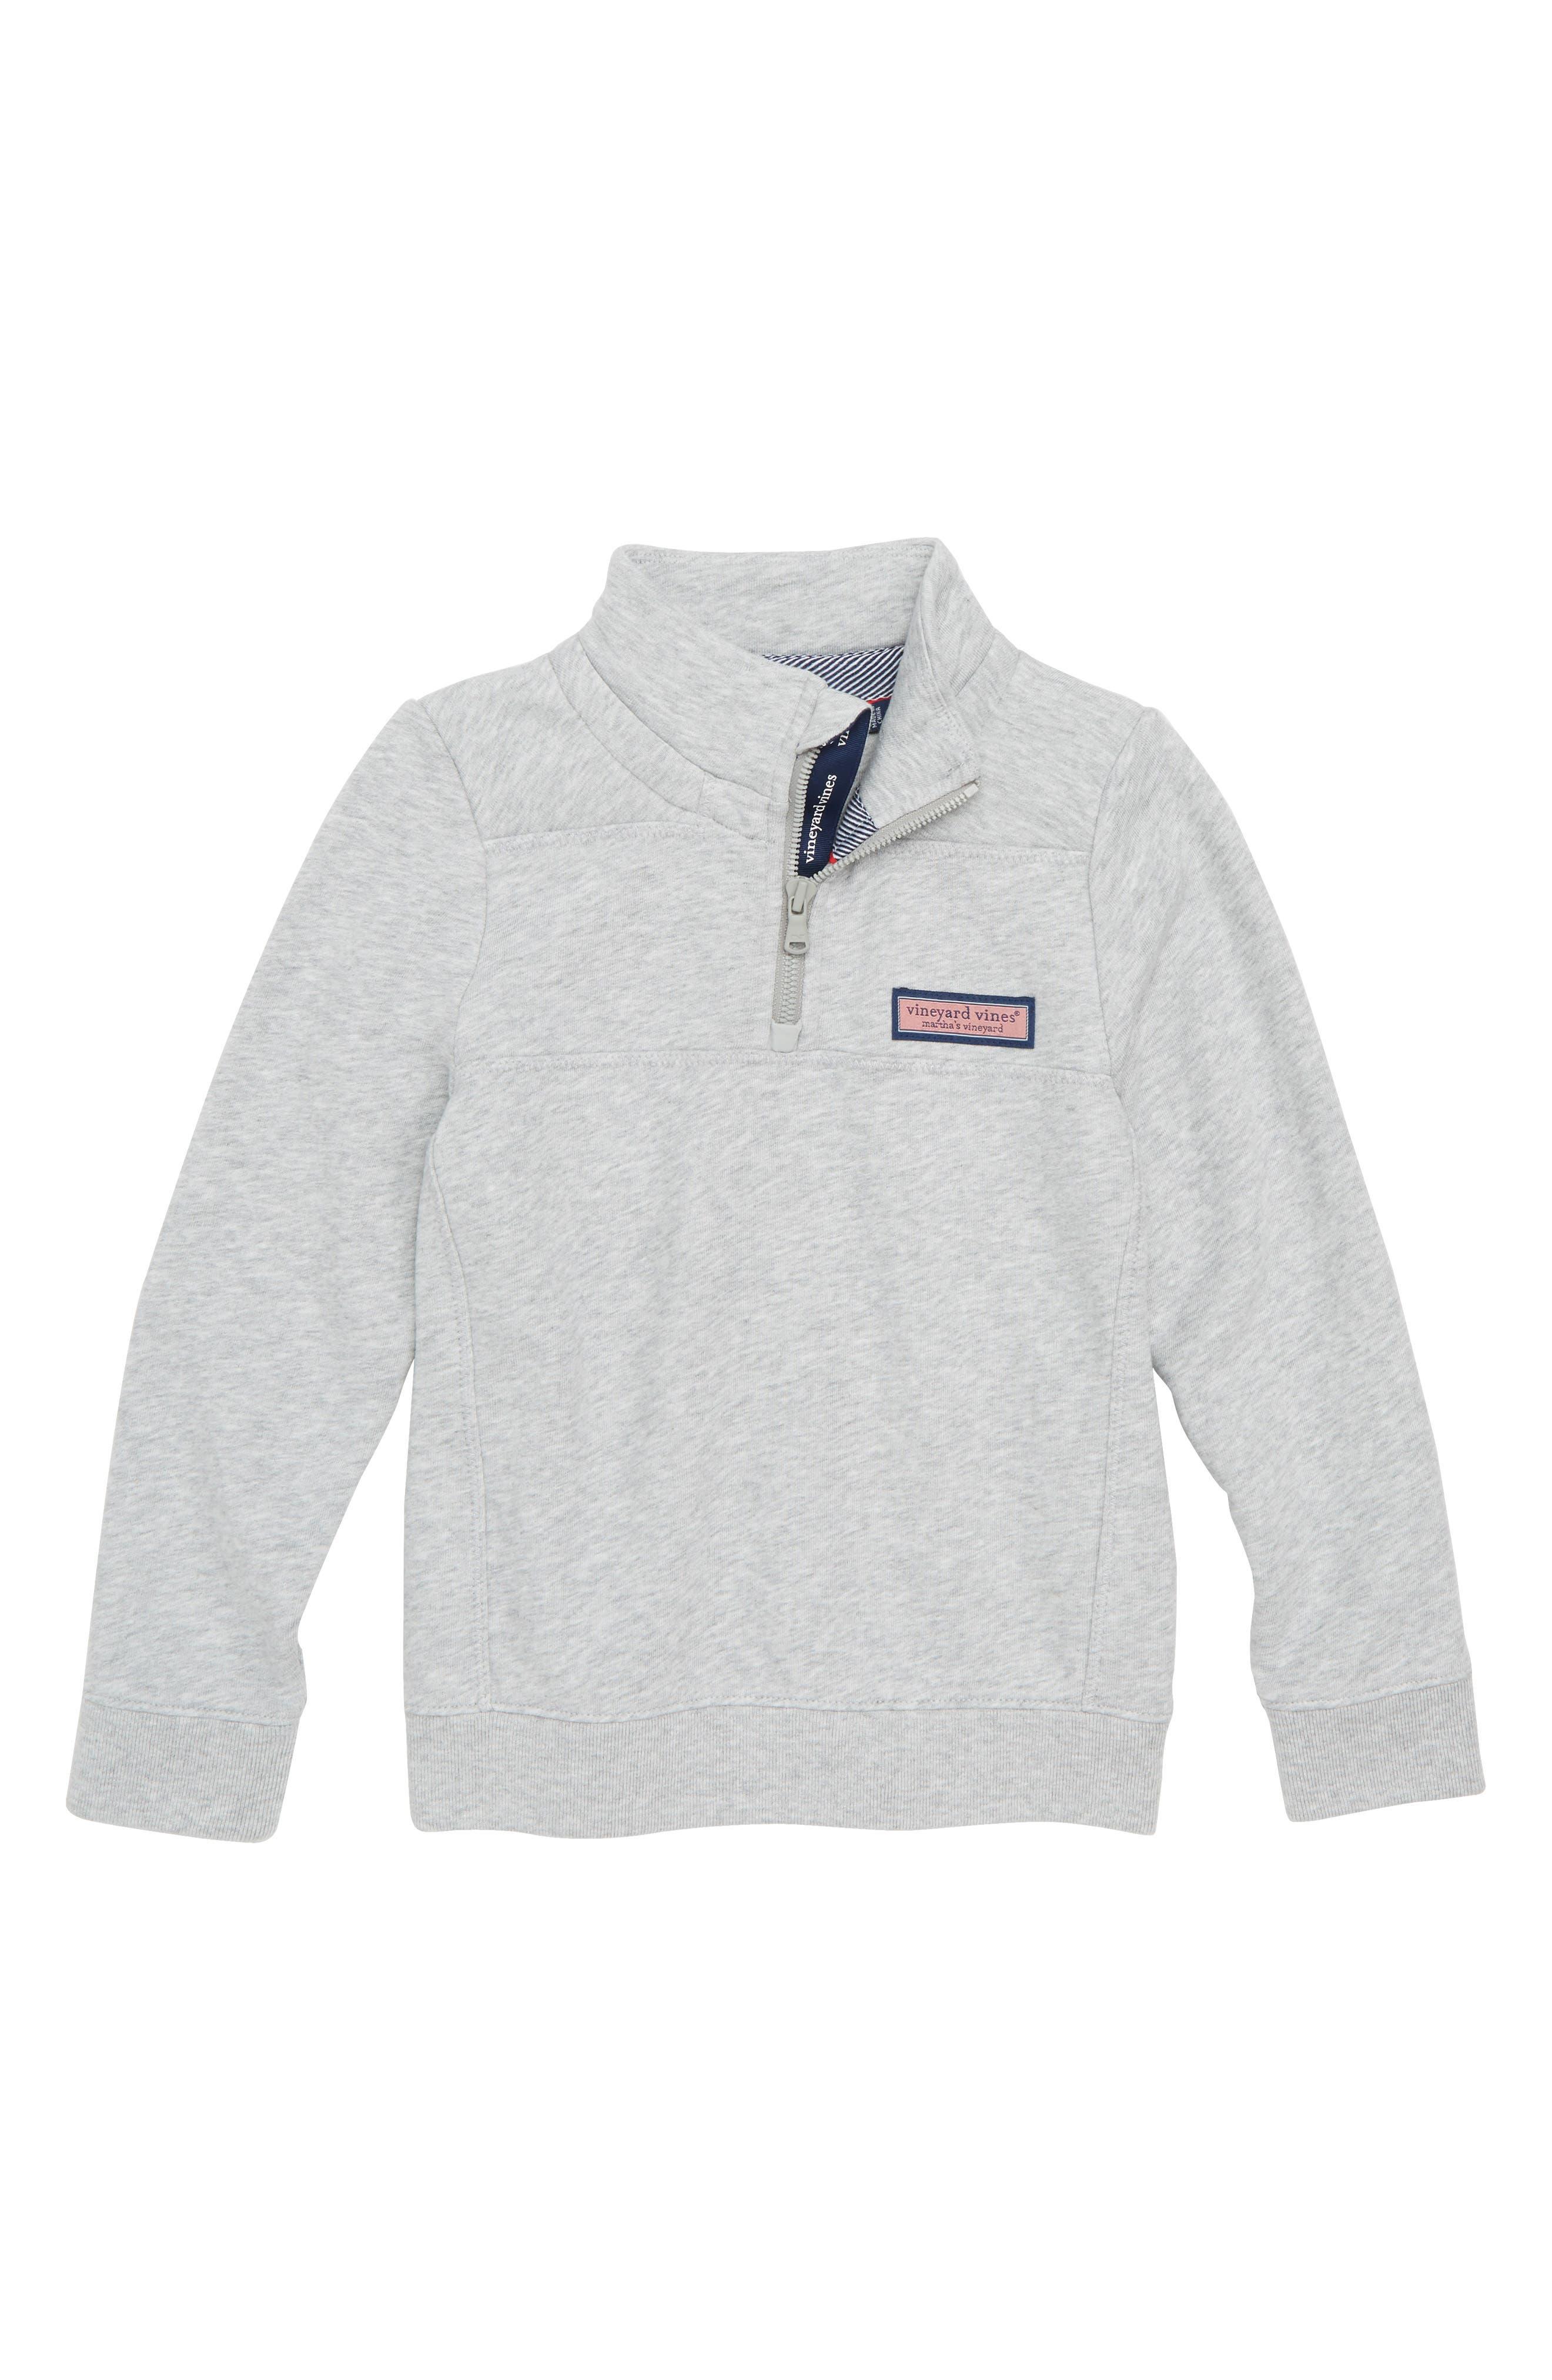 Sail Stitch Shep Quarter Zip Pullover,                         Main,                         color, 039